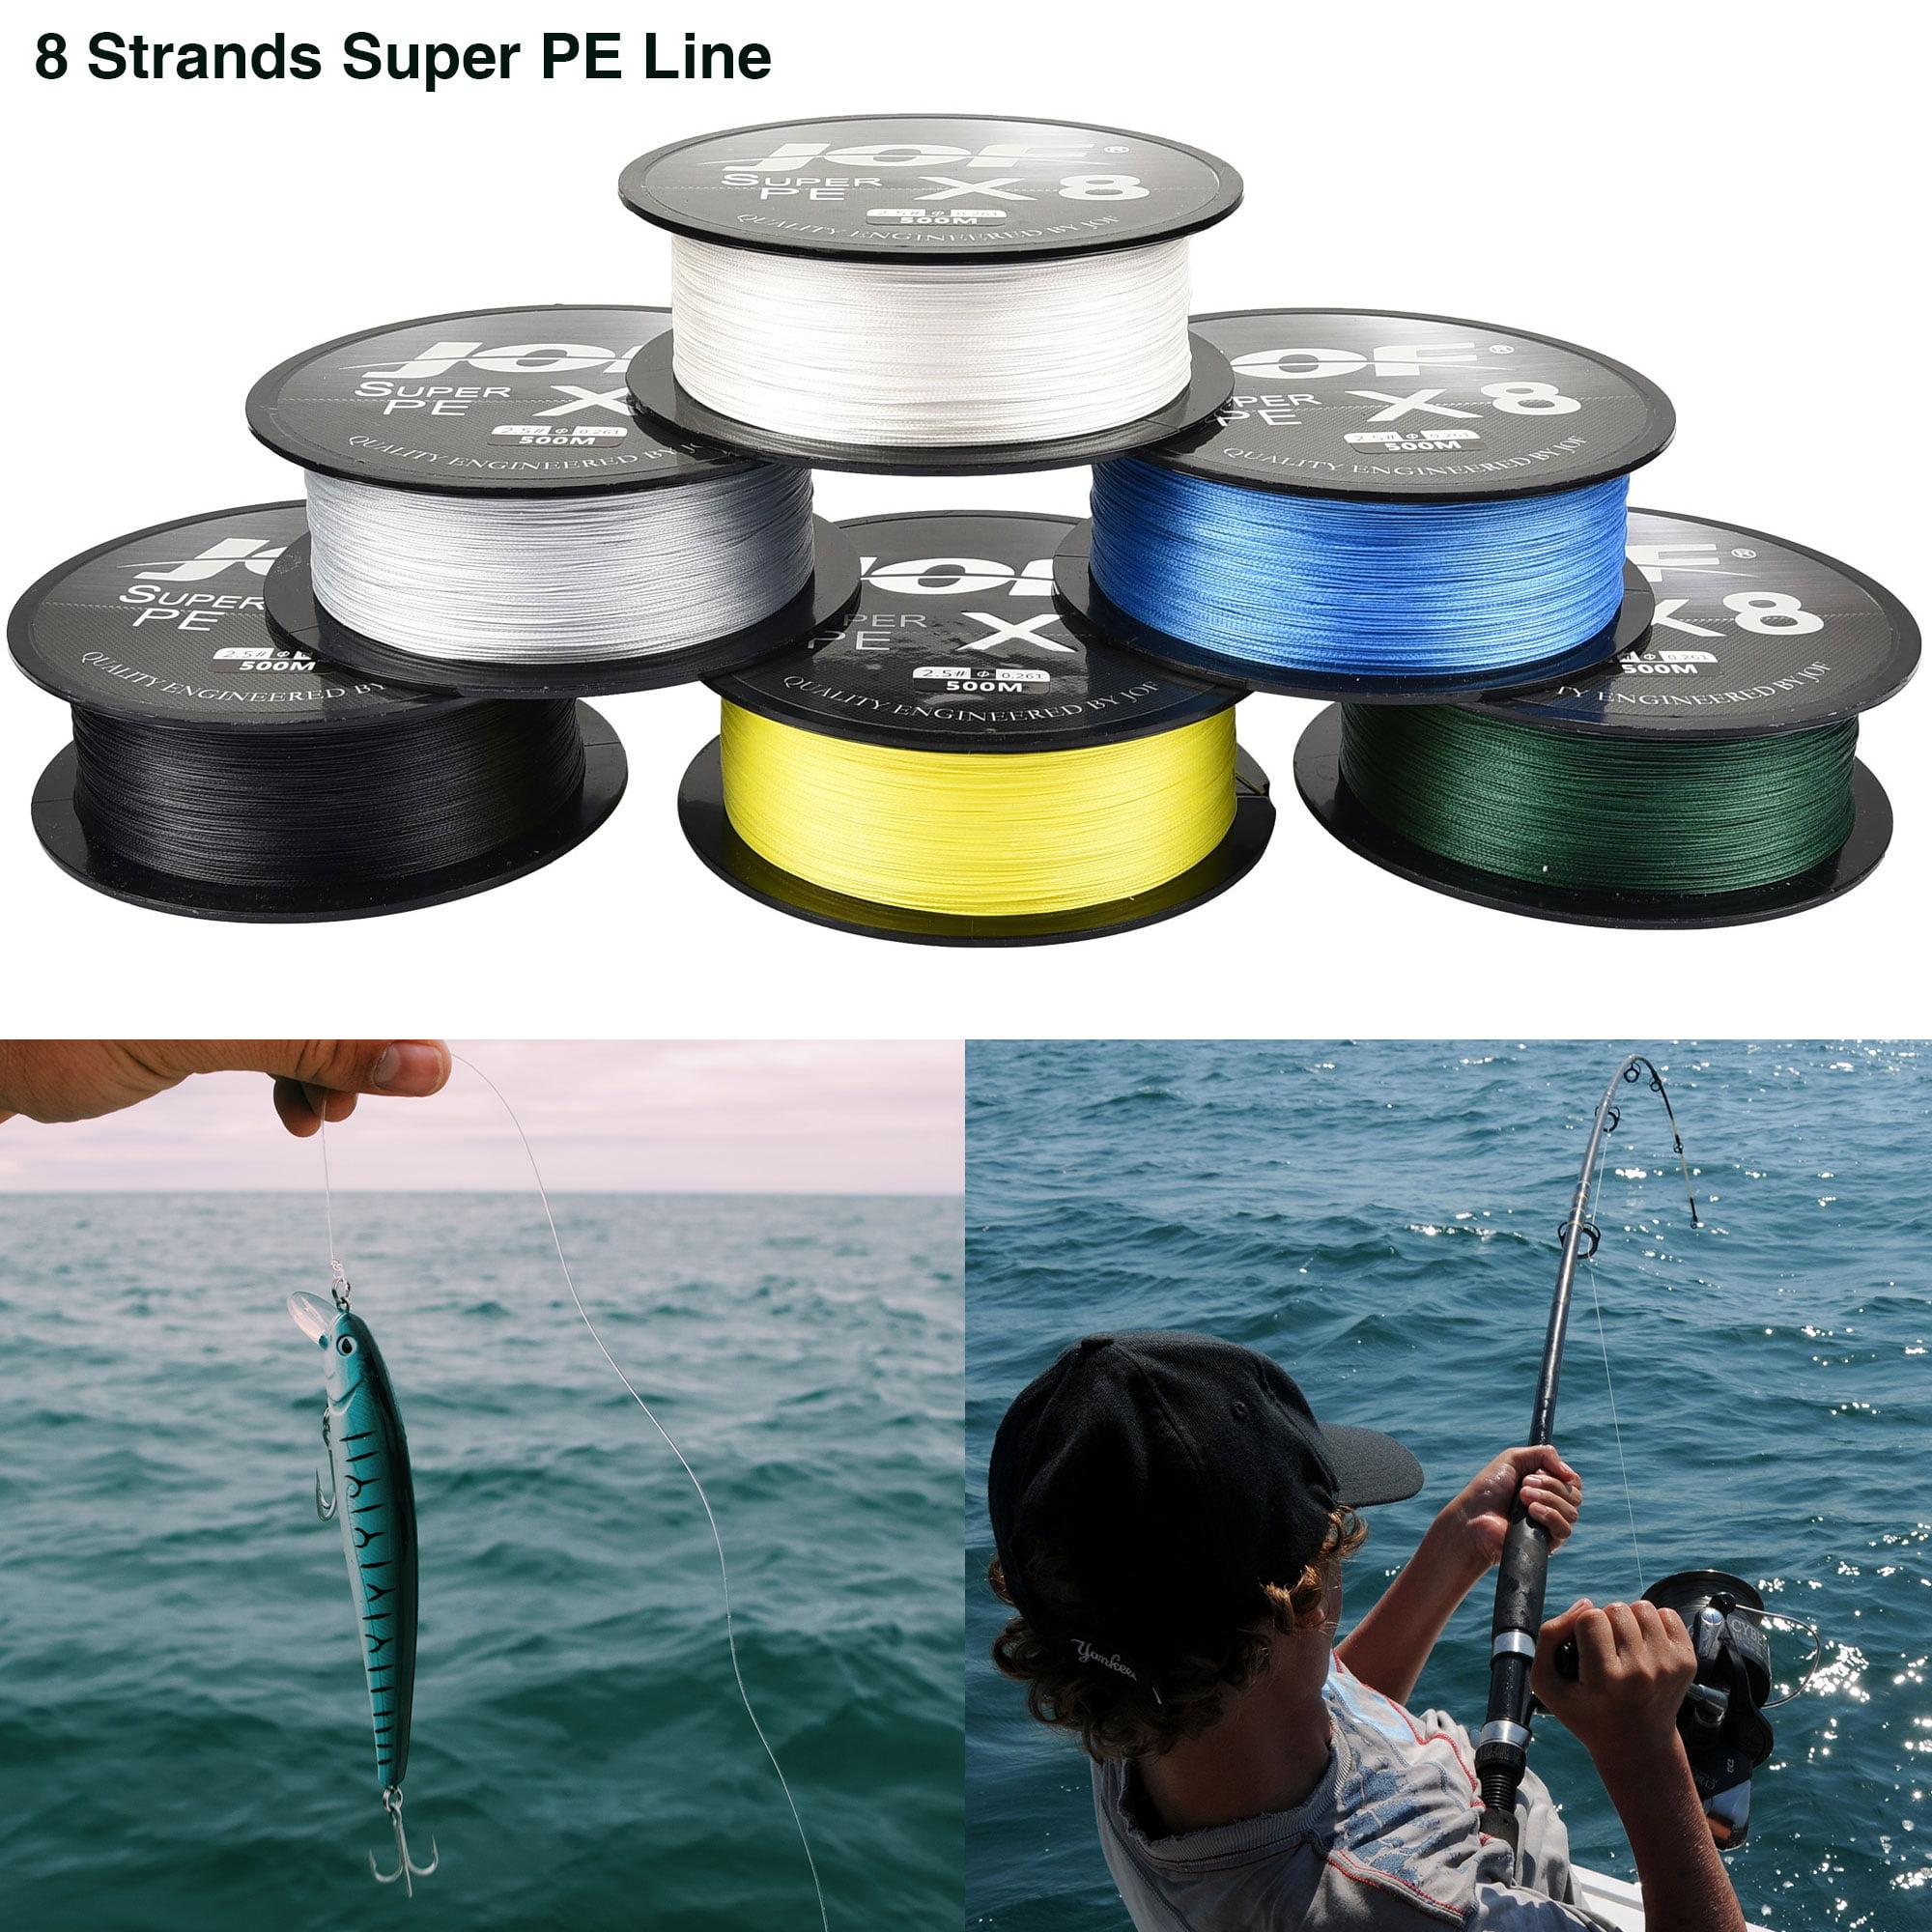 300M-1000M 12LB-160LB Spectra Extreme PE Dyneema 8 Strands Braided Fishing Line